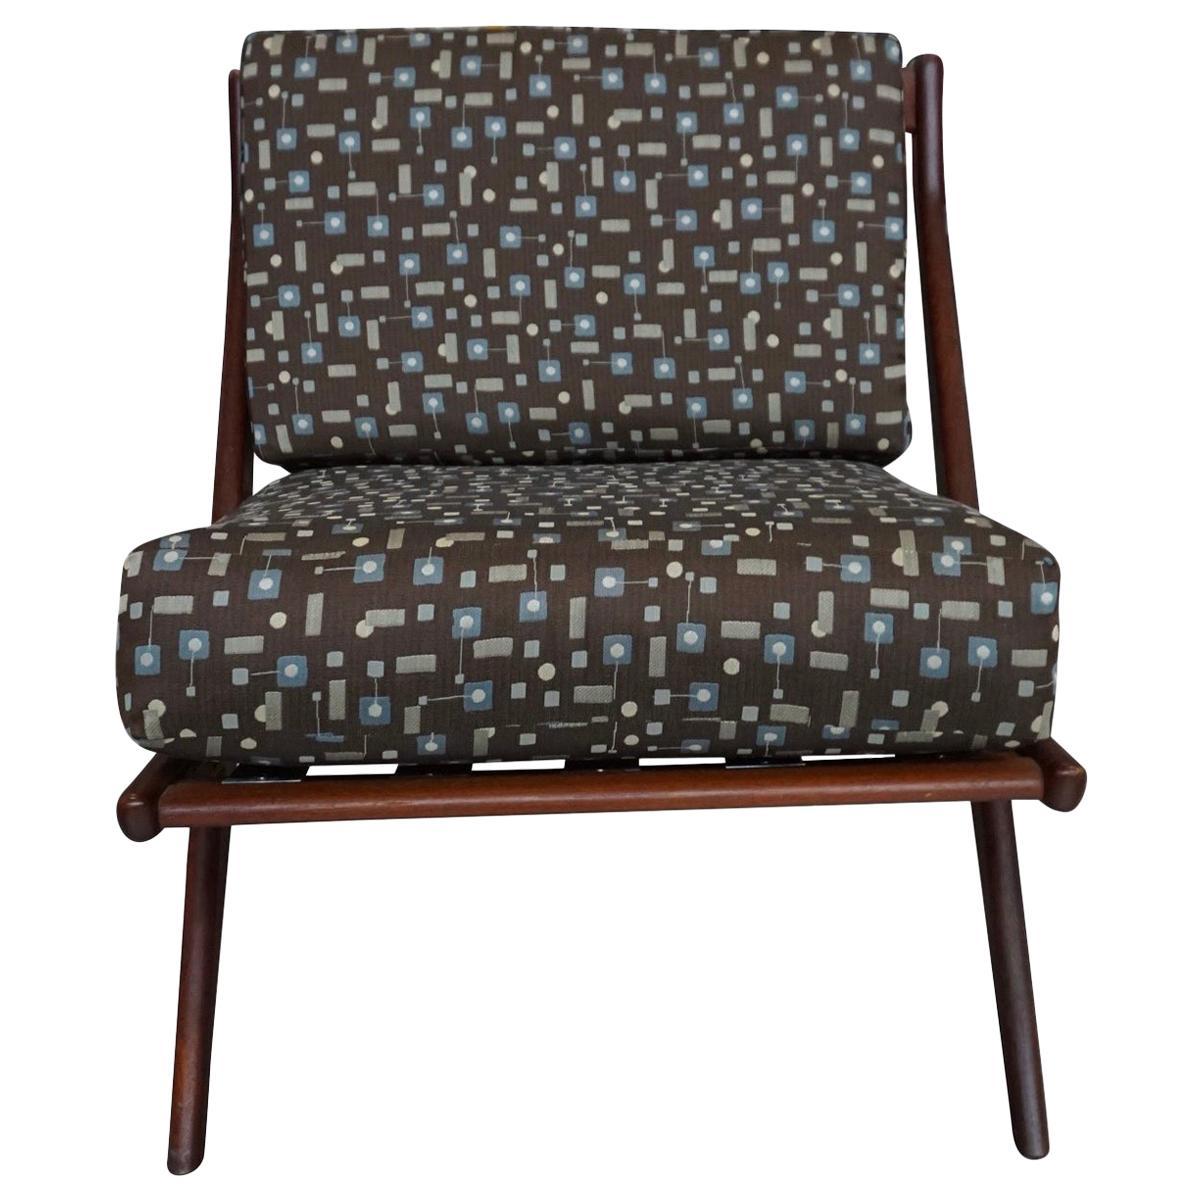 Danish Modern Swedish Folke Ohlsson DUX Scissor Chair